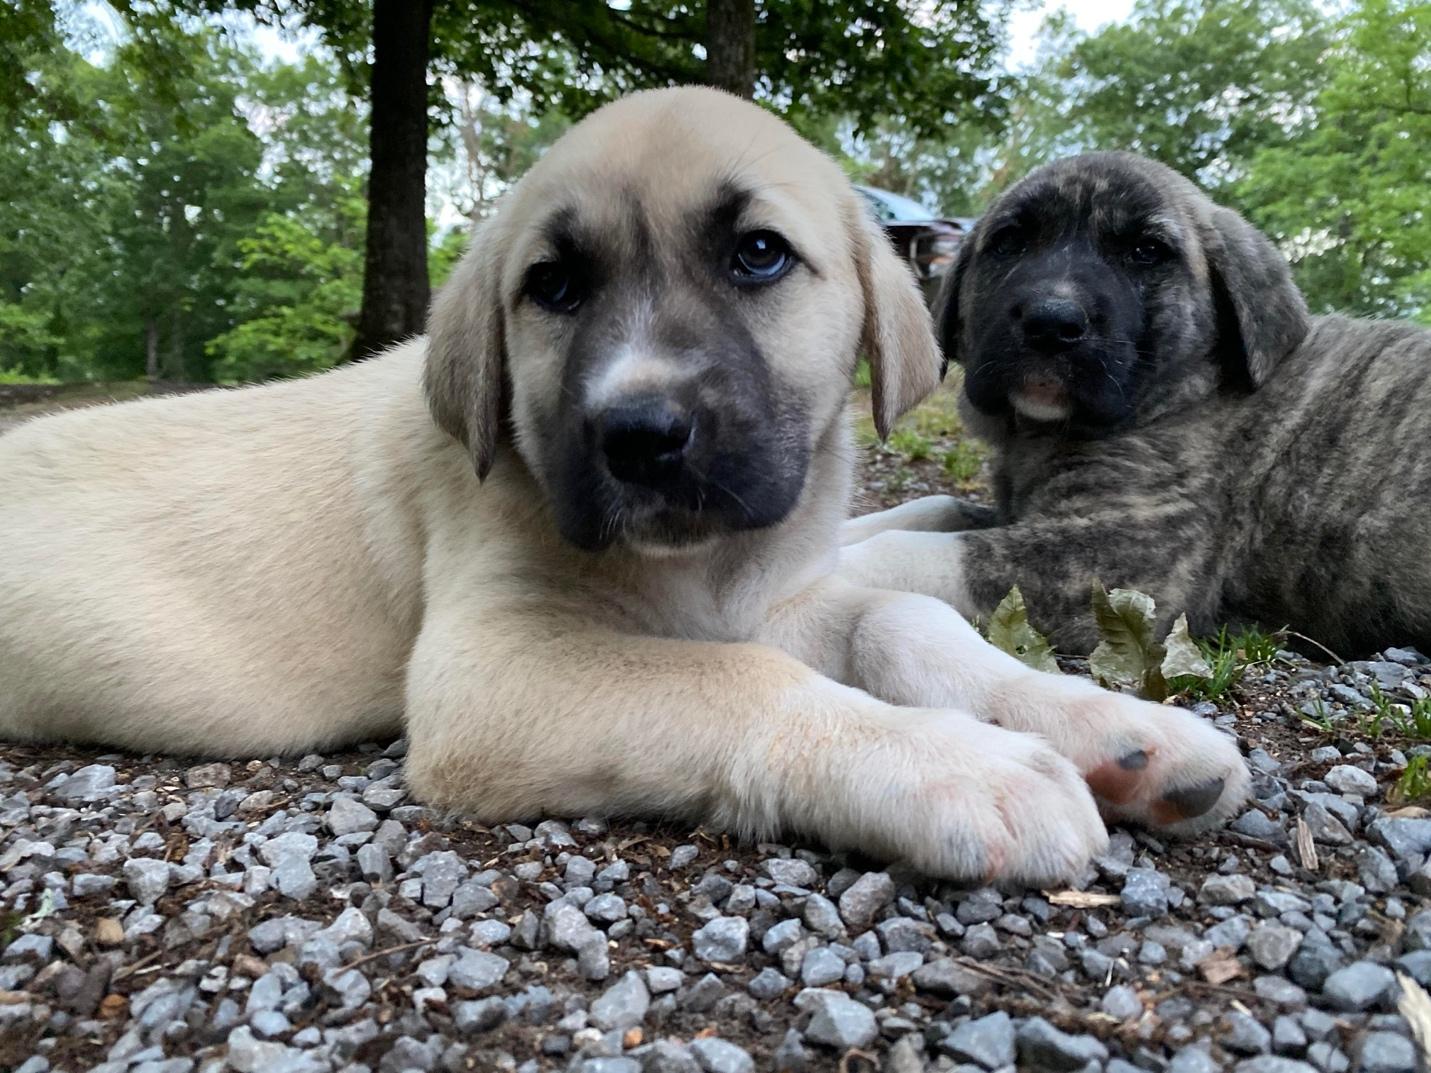 Turkish Boz Shepherd Children and Other Pets